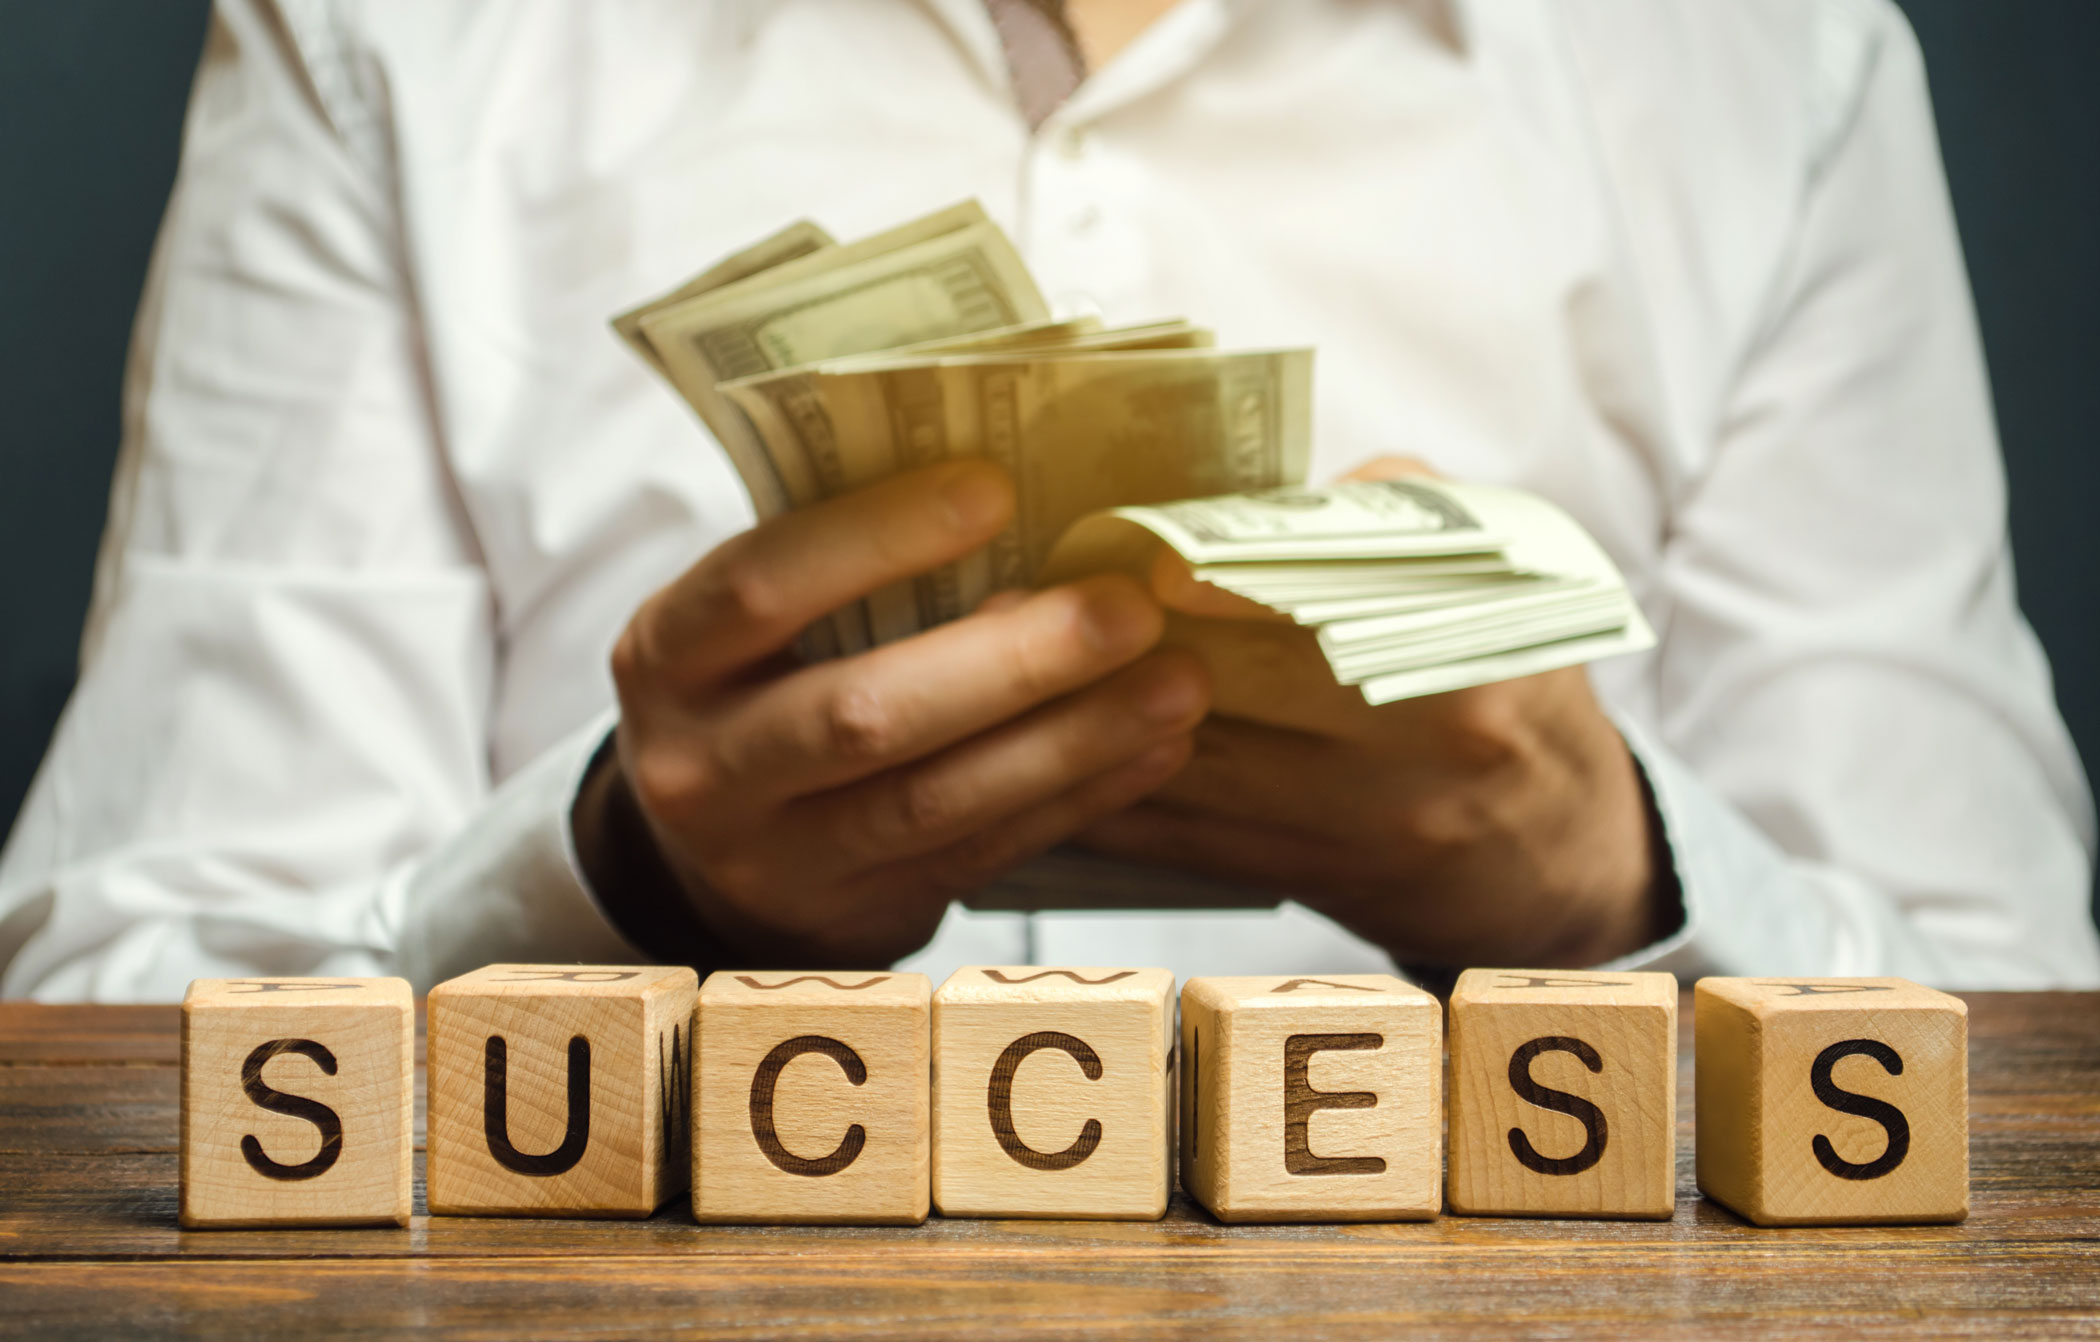 Businessman Success Ismail Sirdah